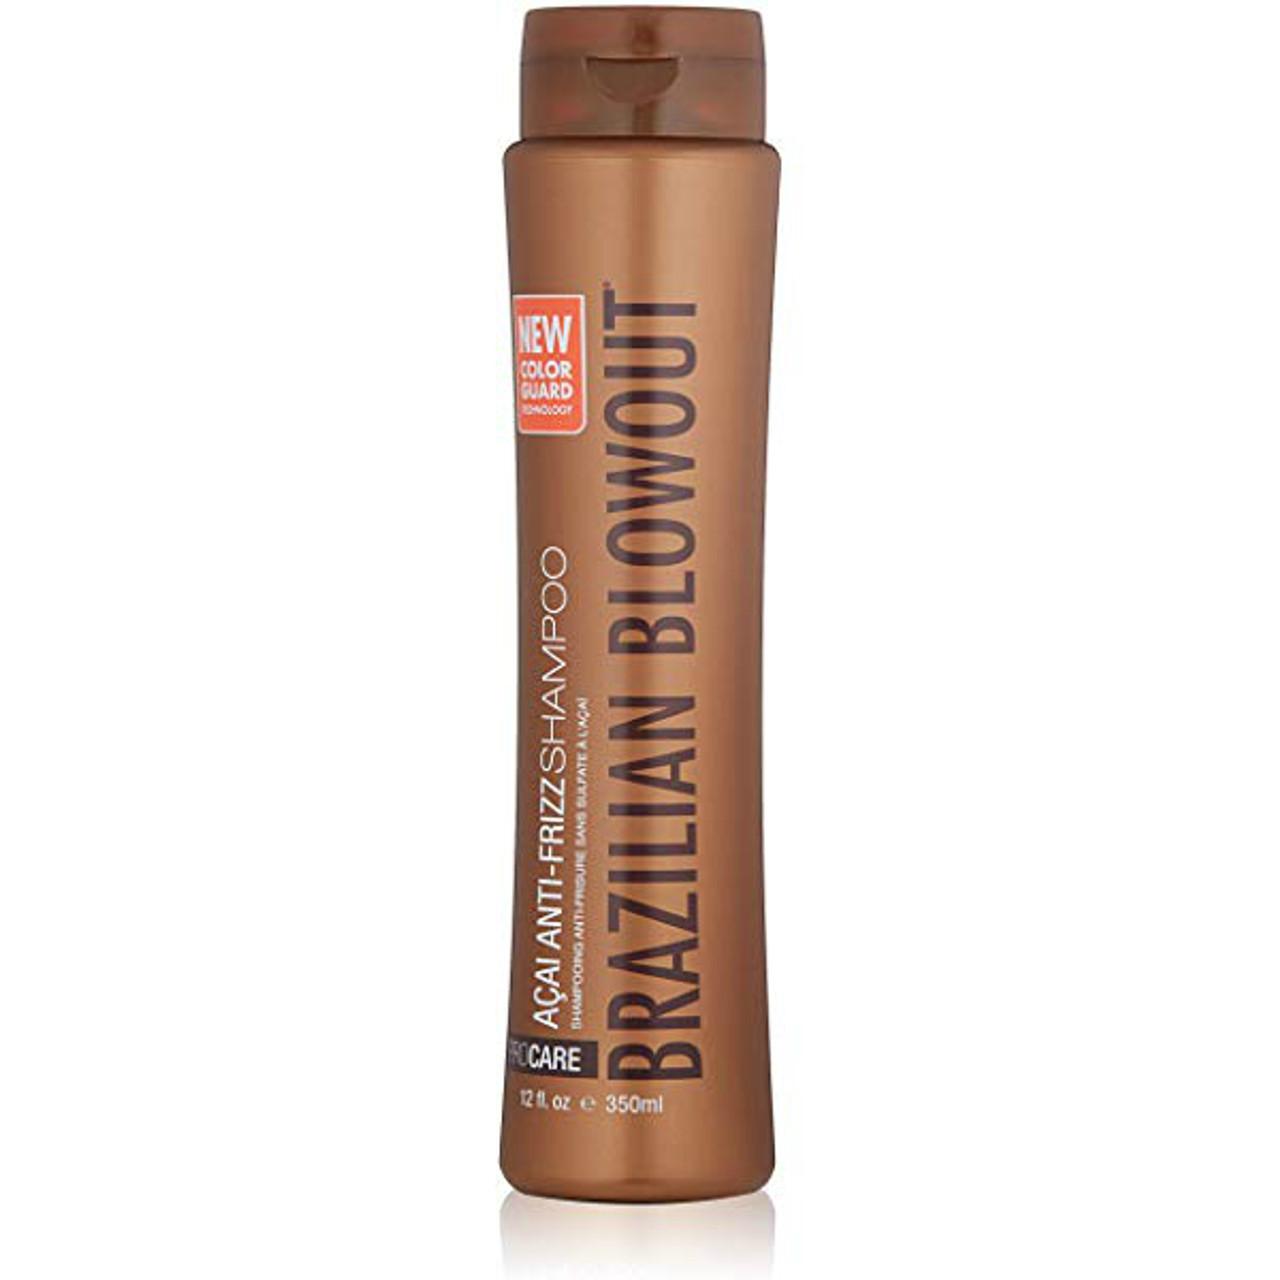 Brazilian Blowout Acai Anti-Frizz Shampoo 12 oz